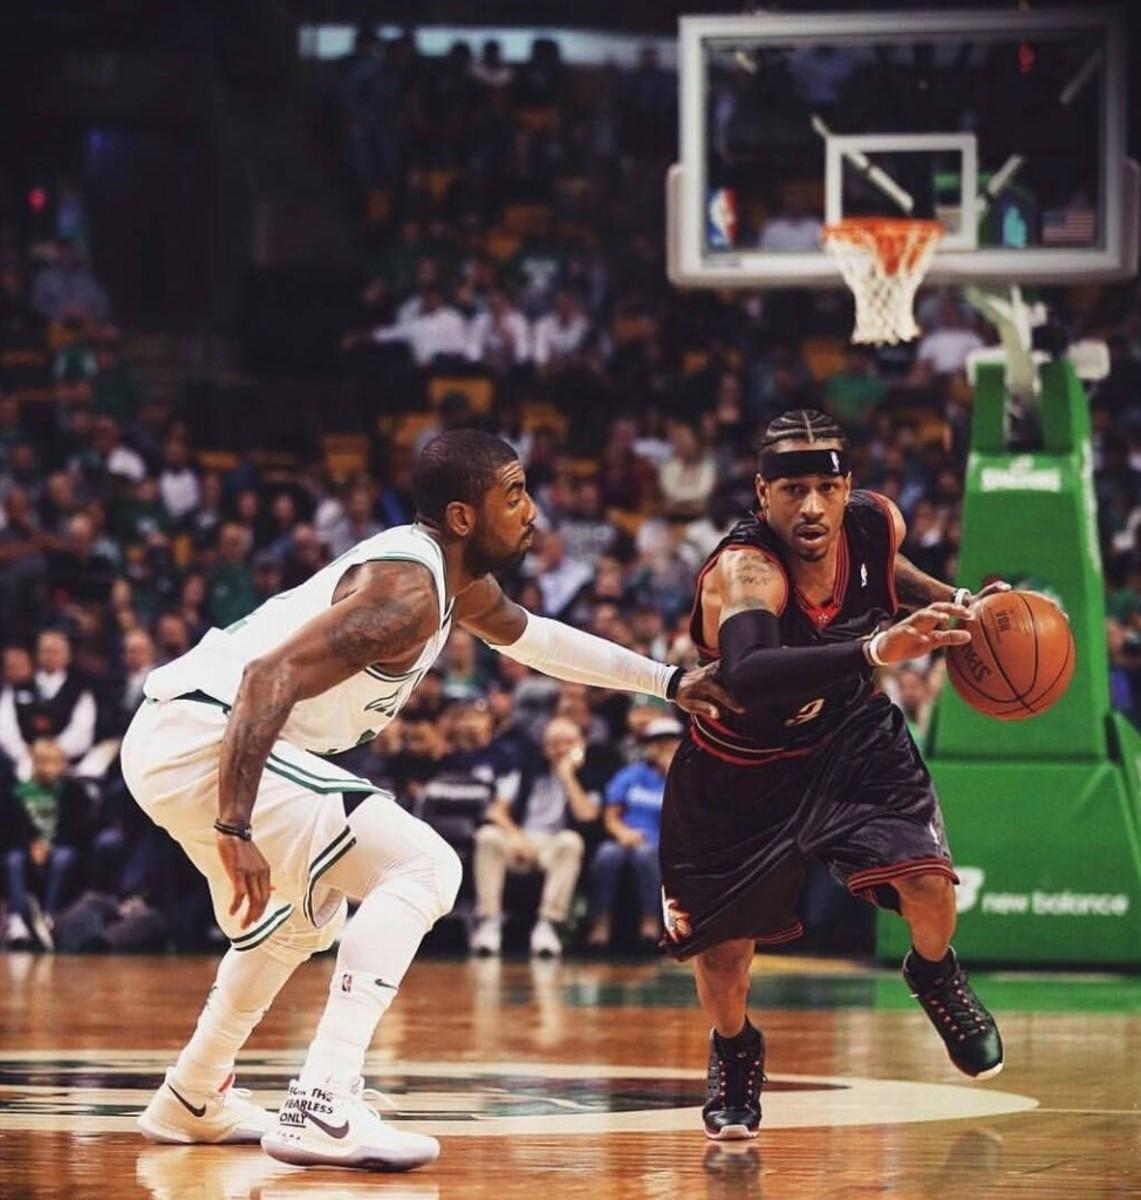 Allen Iverson vs. Kyrie Irving